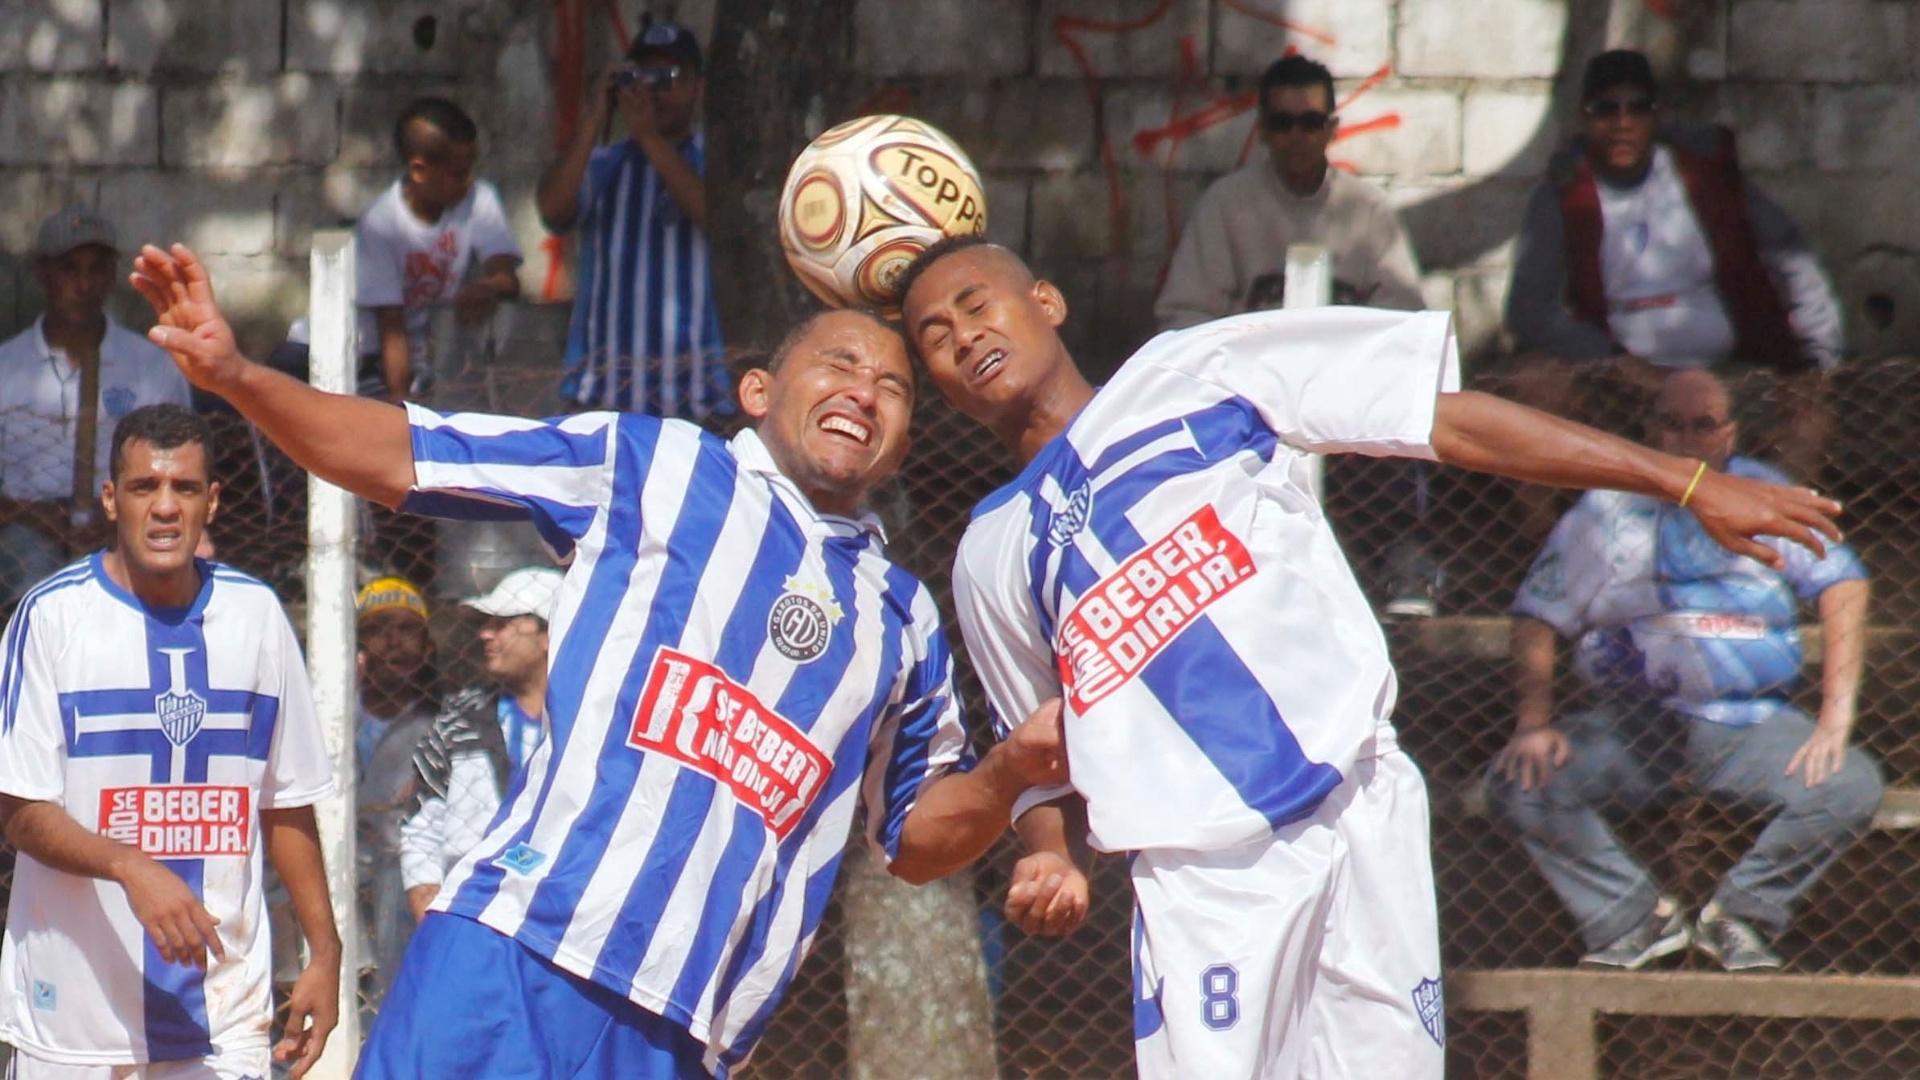 Lance de Vila Rica (branco) x Unidos Heliopolis (azul e branco)